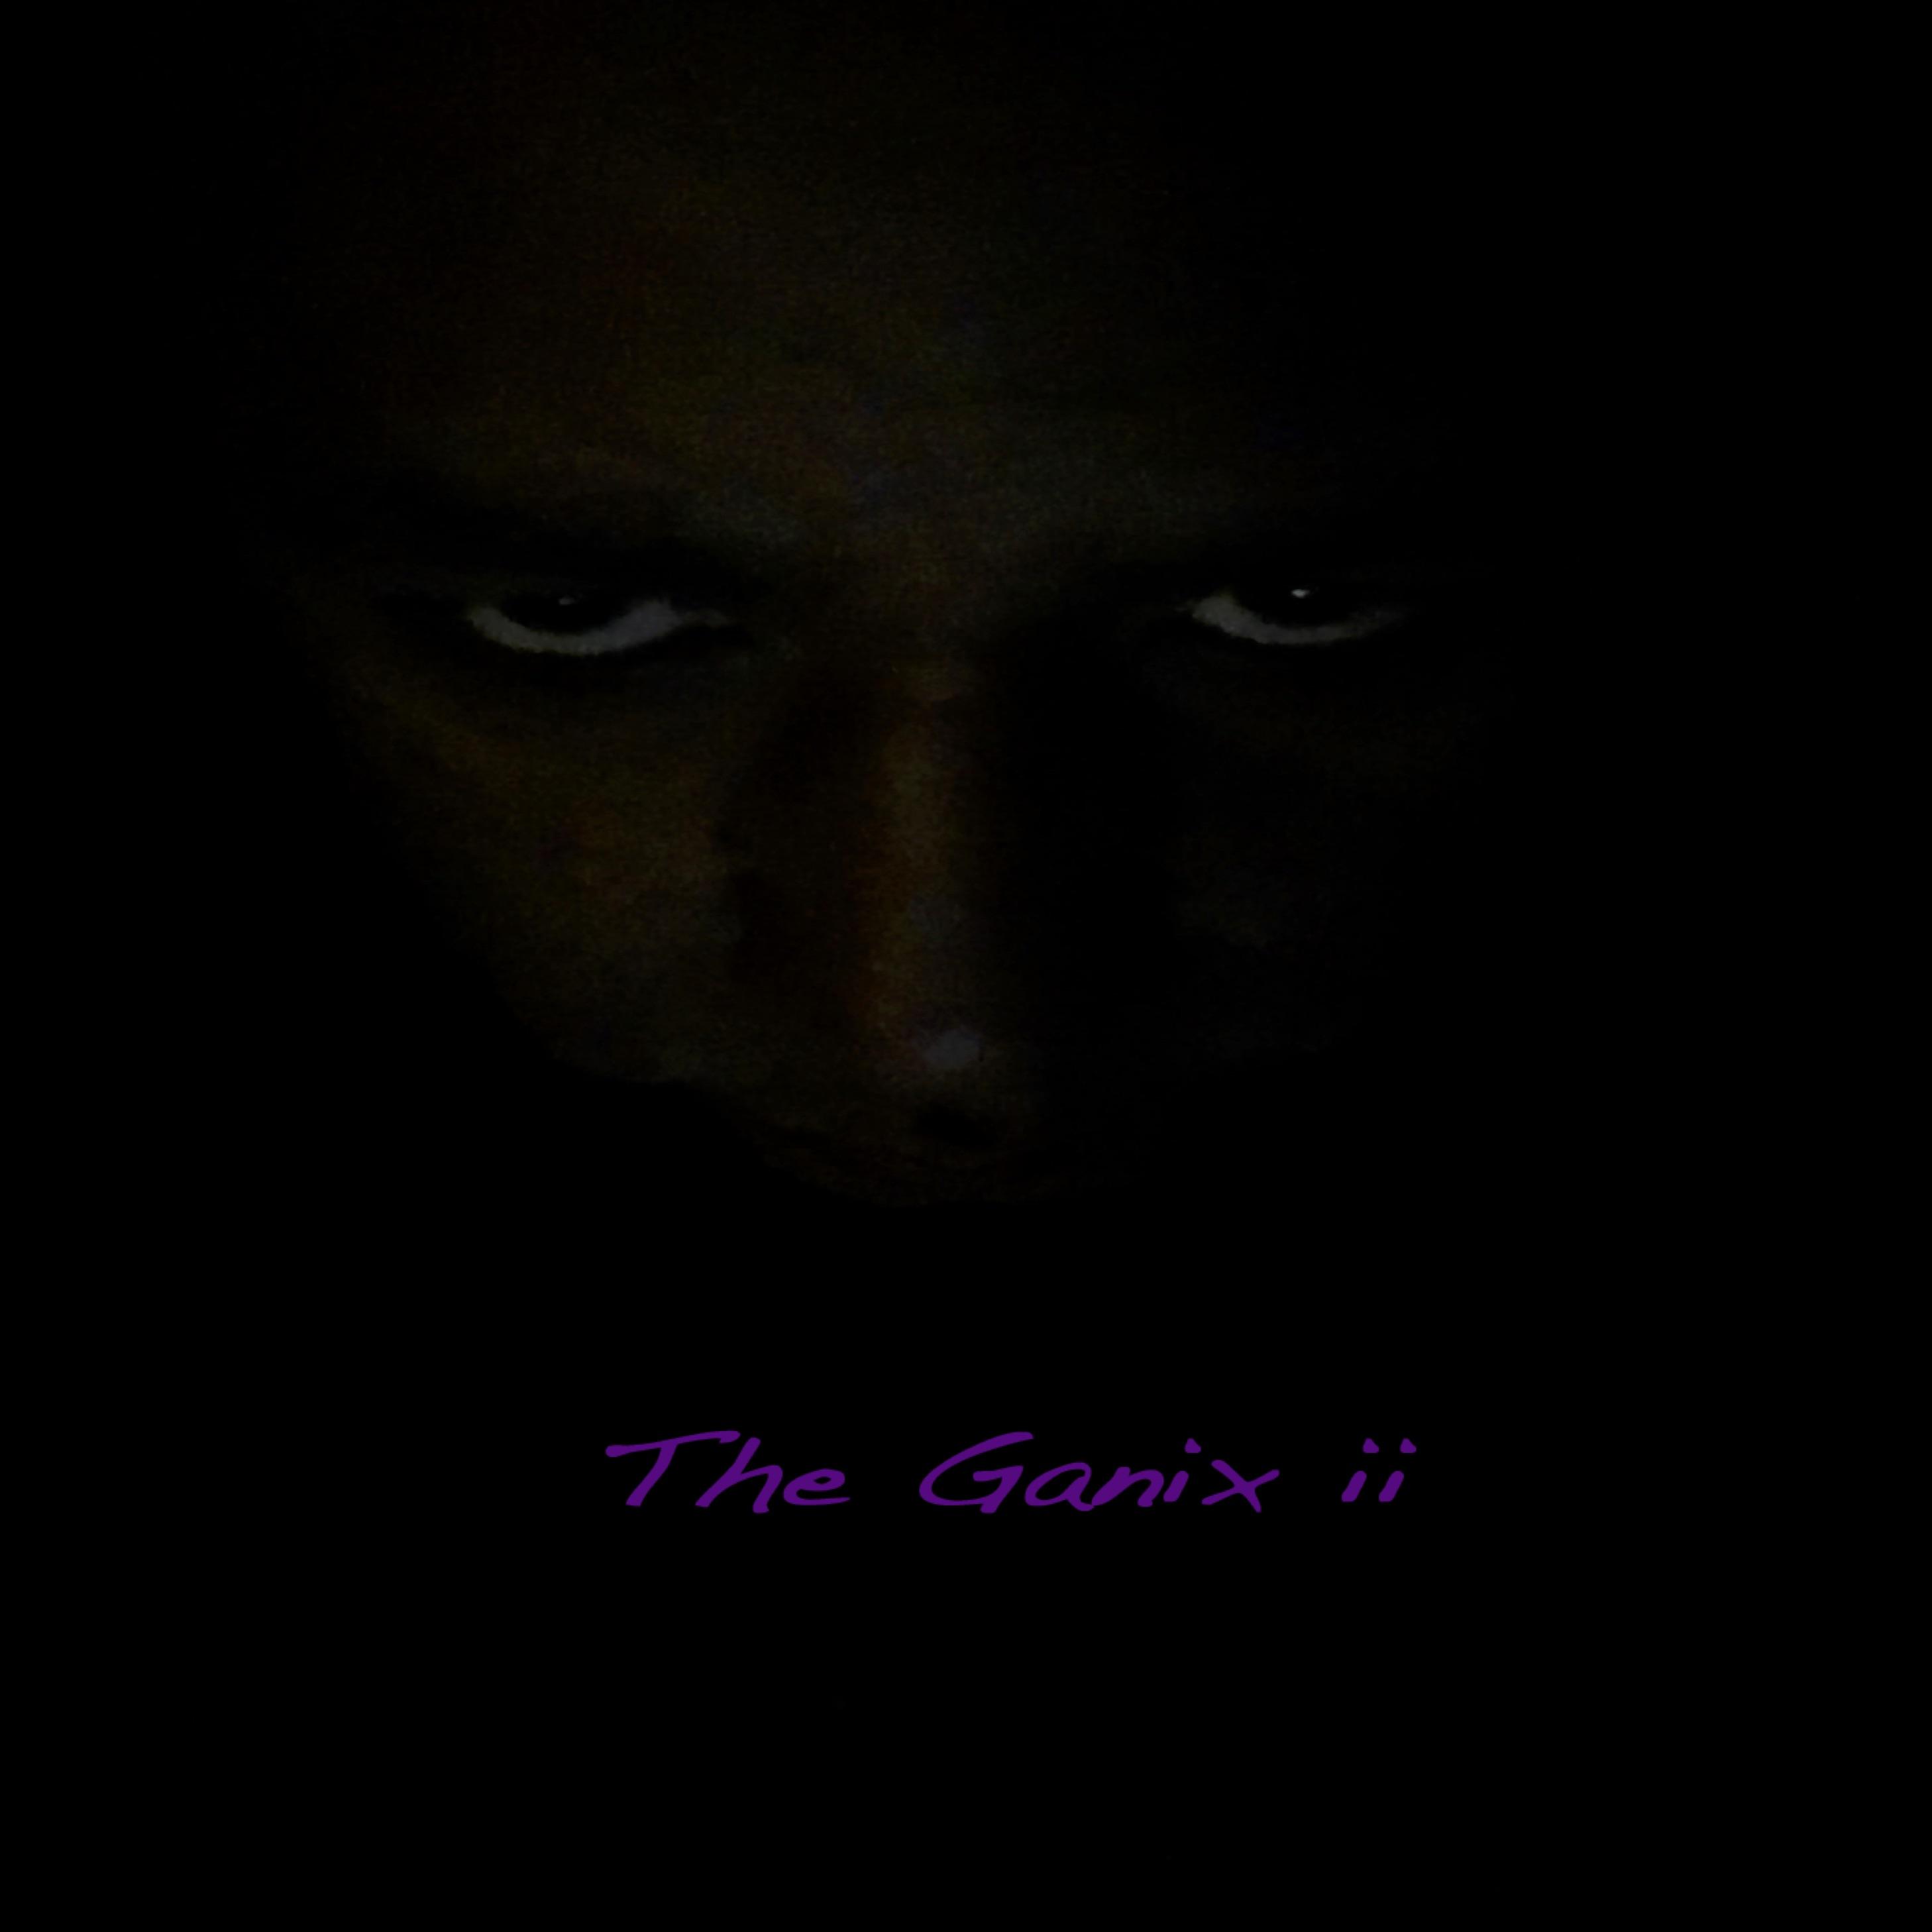 The Ganix ii